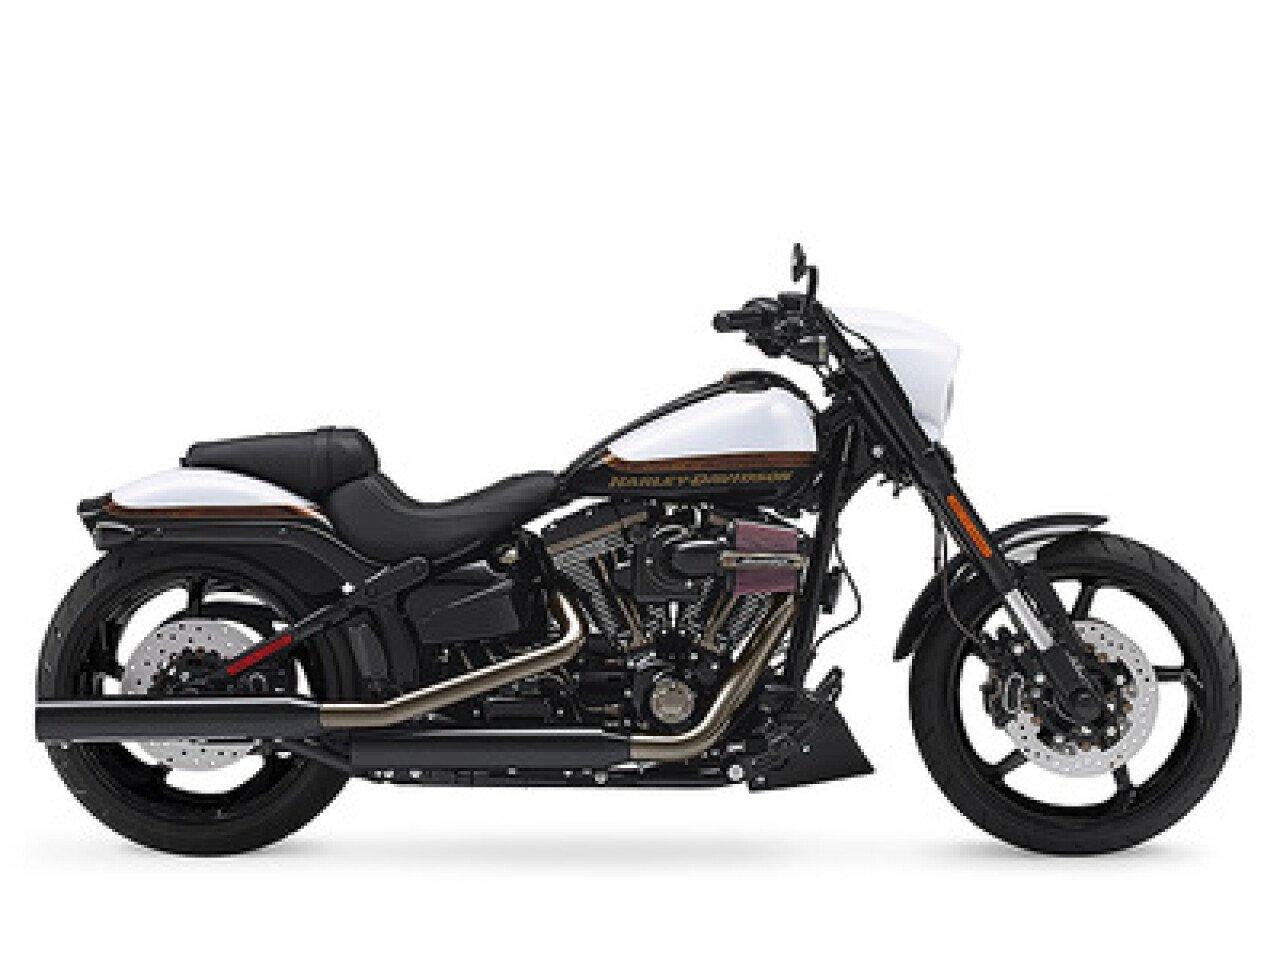 2017 Harley Davidson CVO for sale near Meridian Idaho